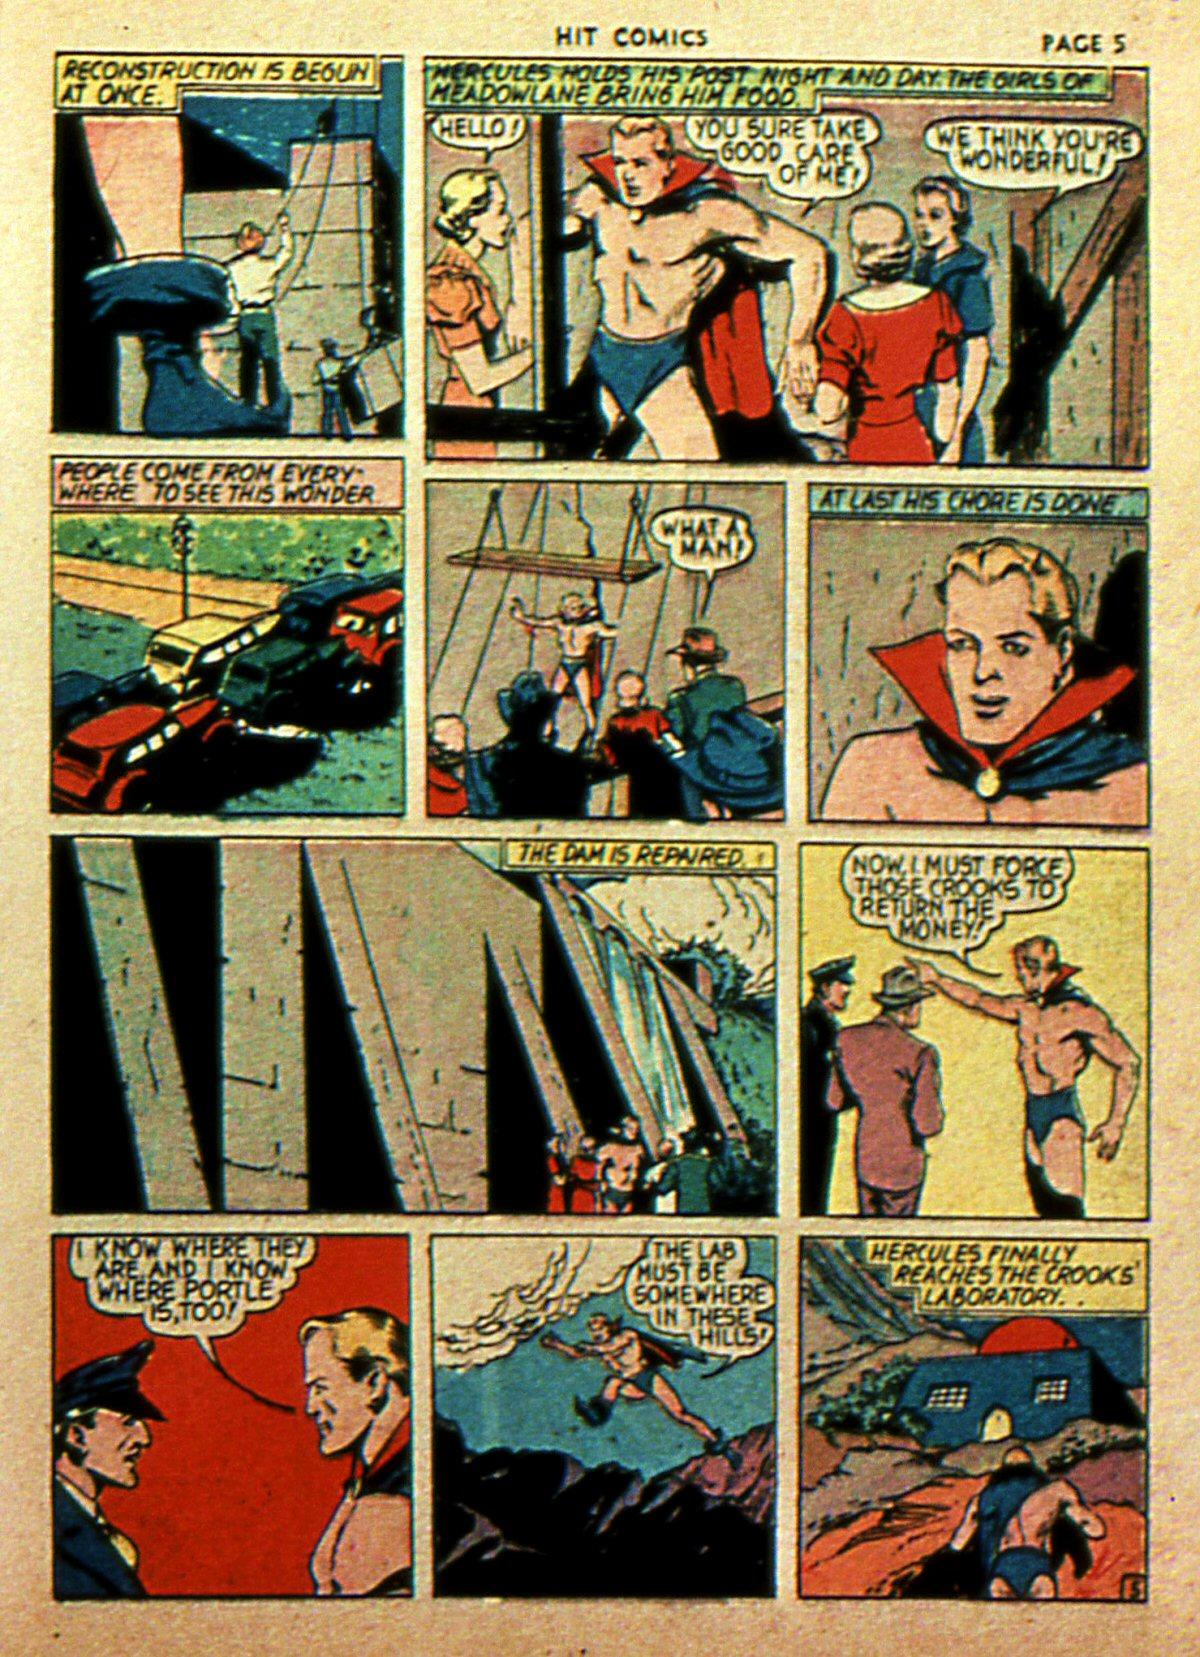 Read online Hit Comics comic -  Issue #2 - 7